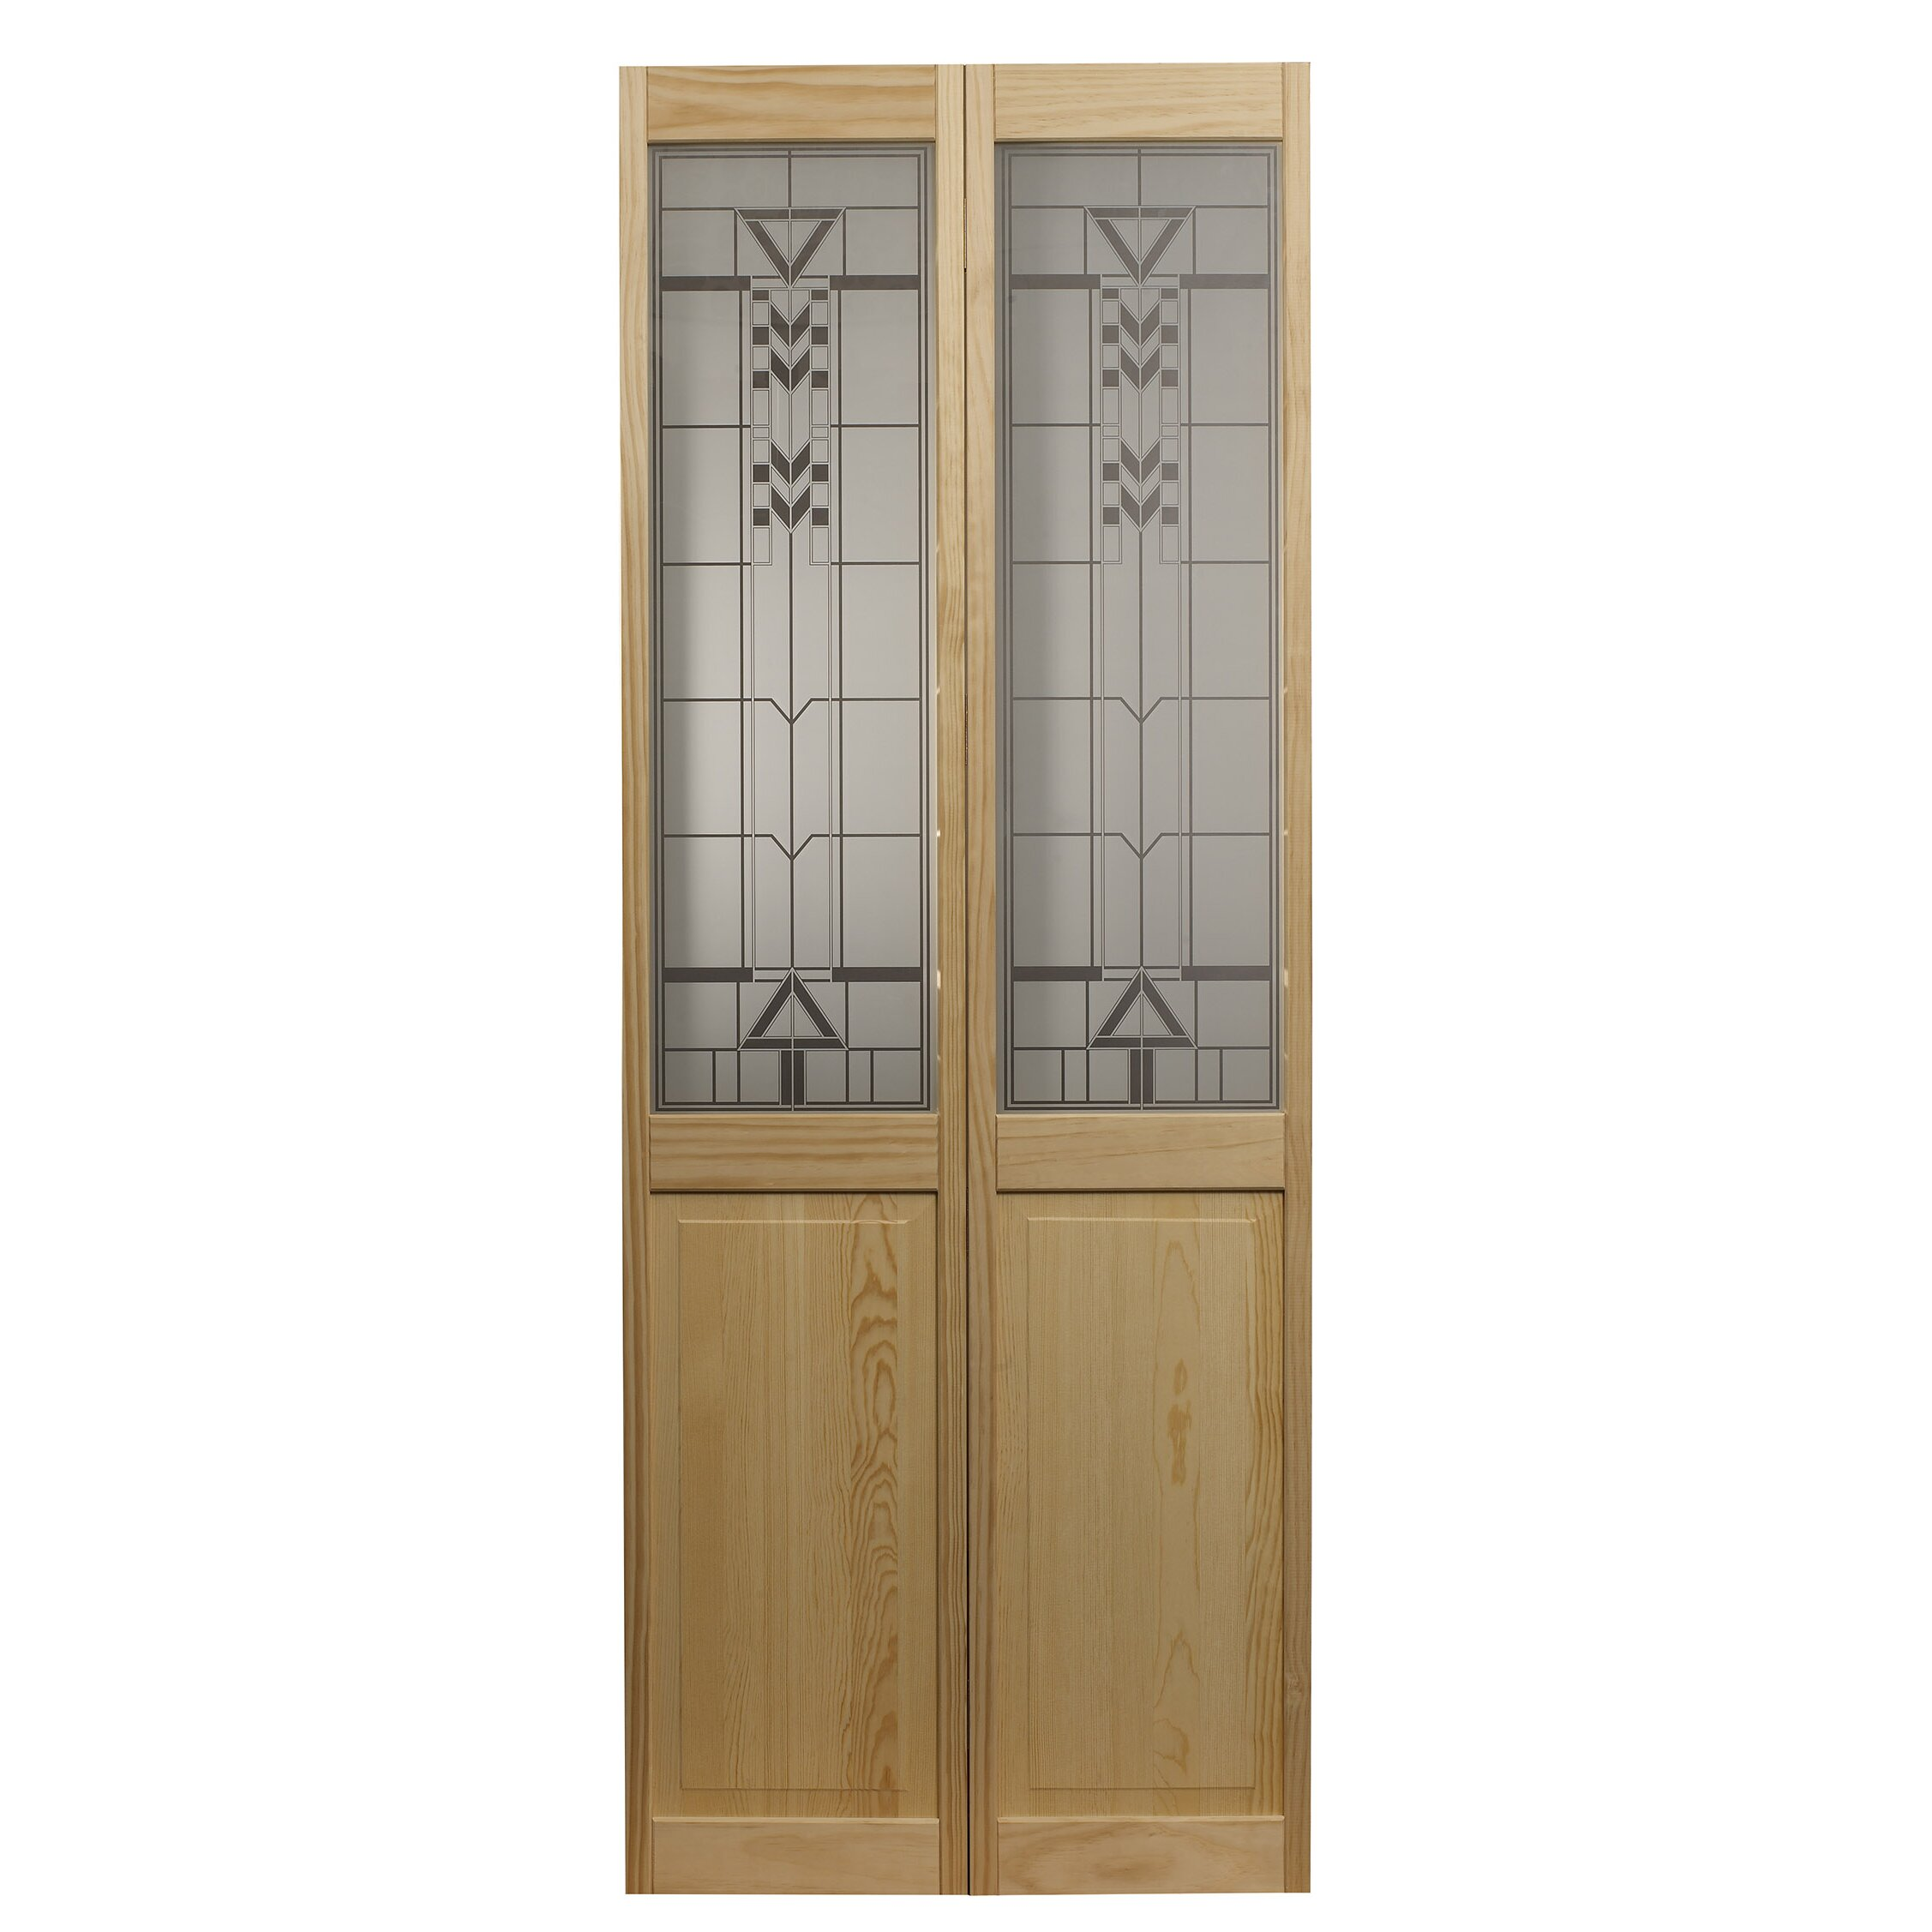 Ltl Bi Fold Doors Pinecroft Wood Unfinished Bi Fold Interior Door Reviews Wayfair